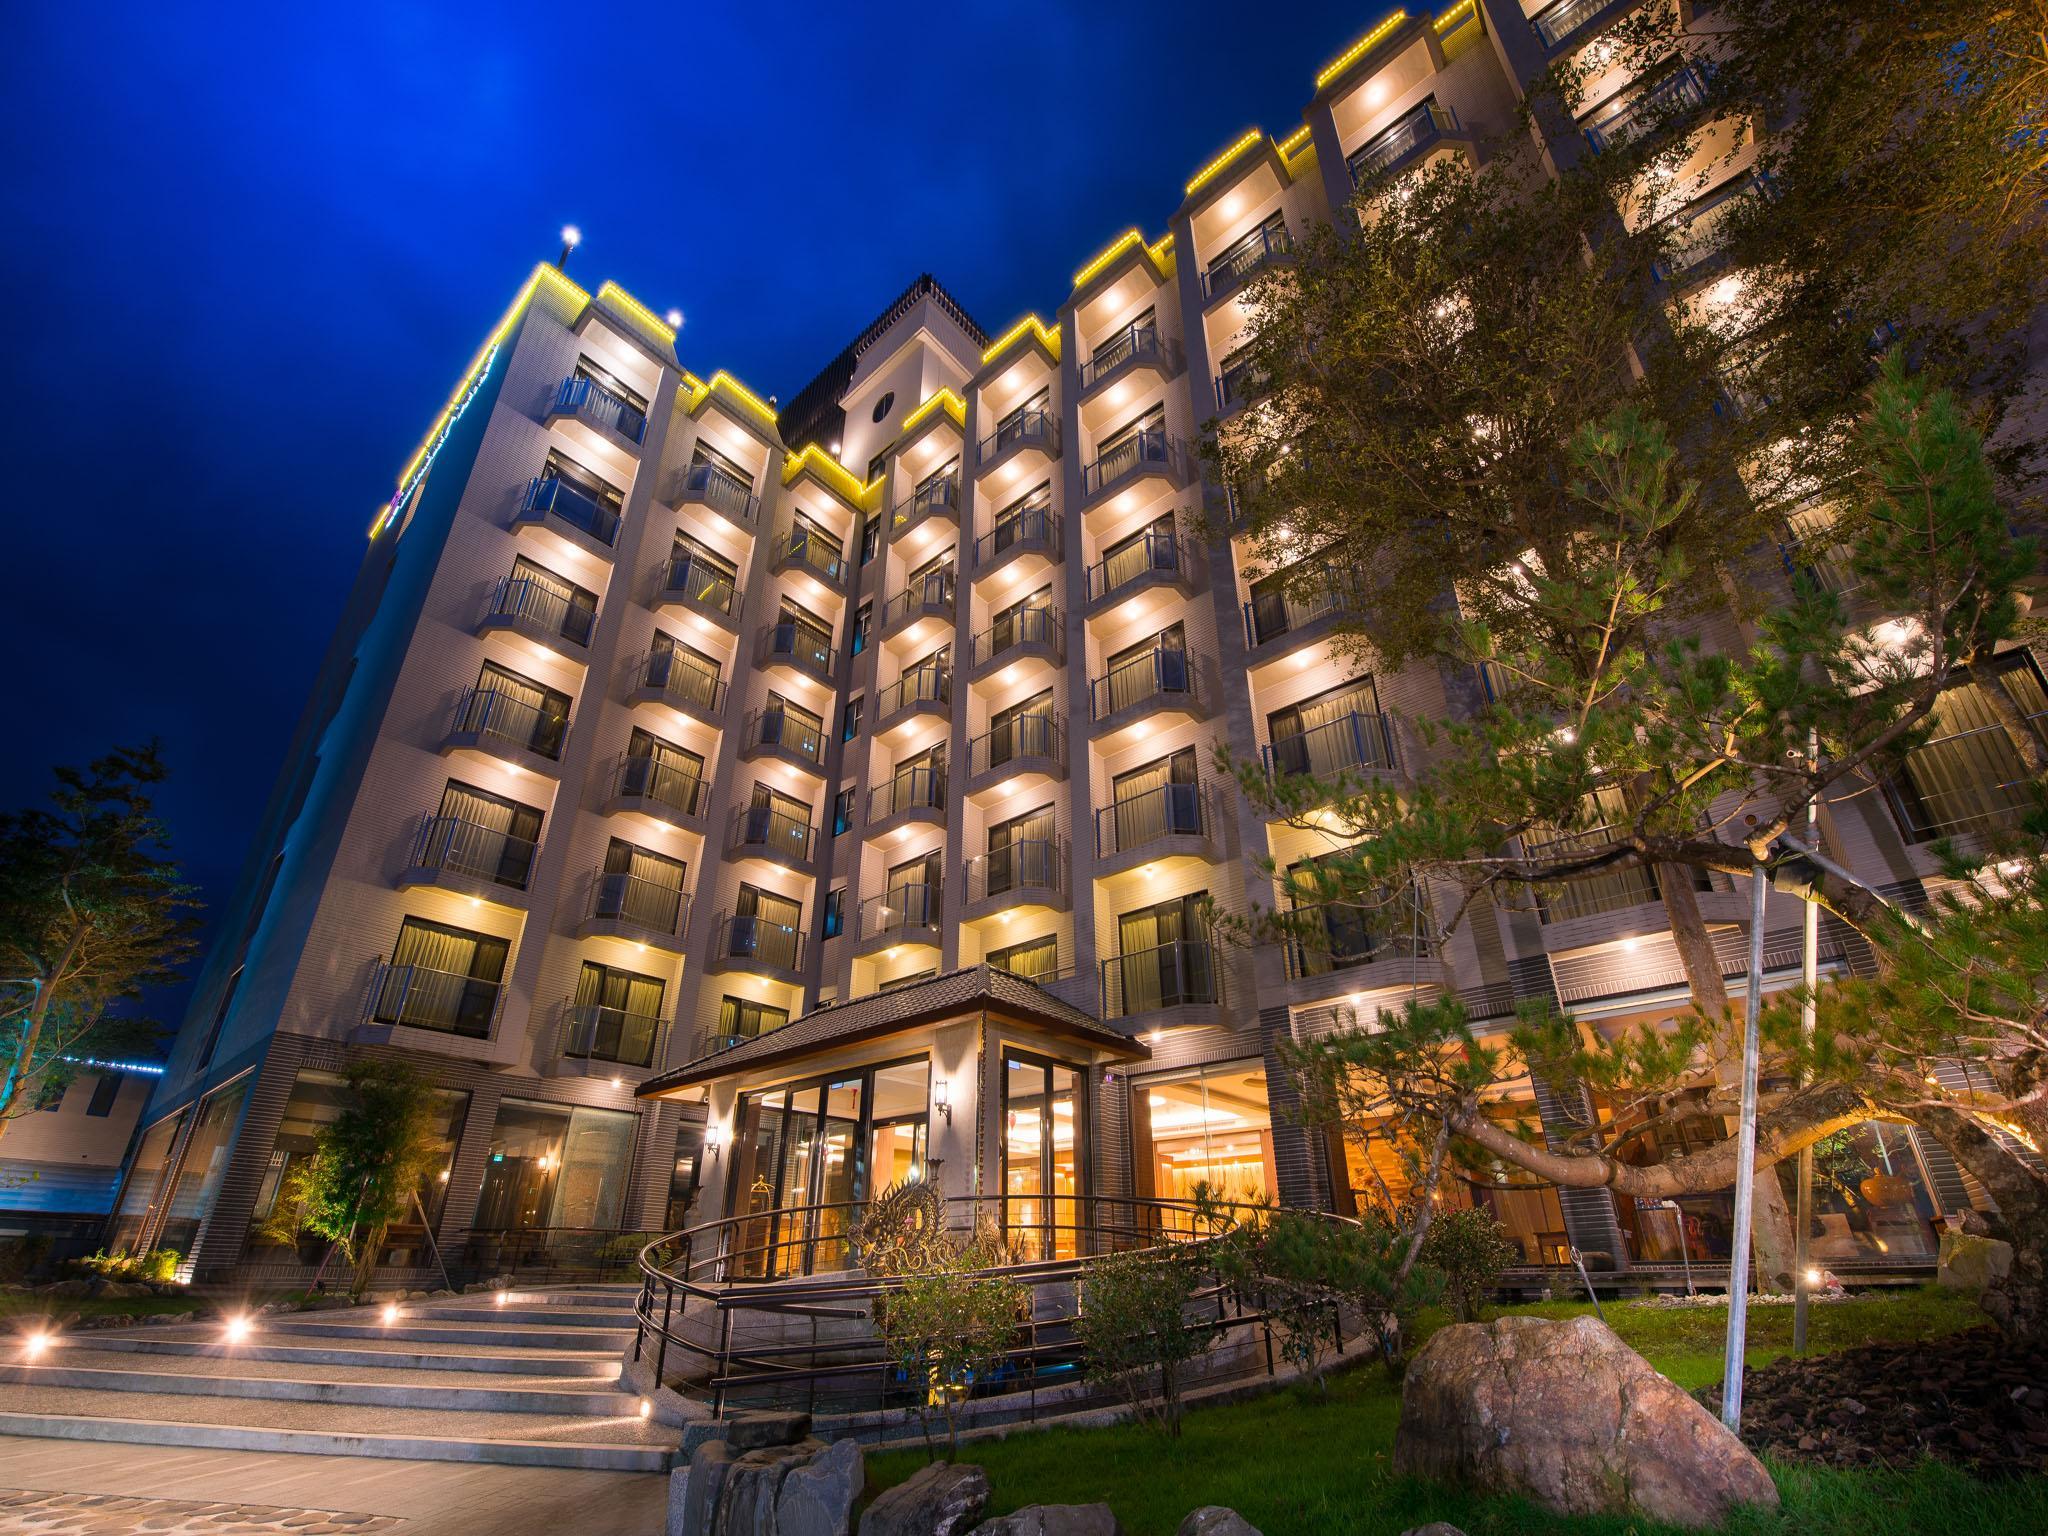 Shandori Hotel